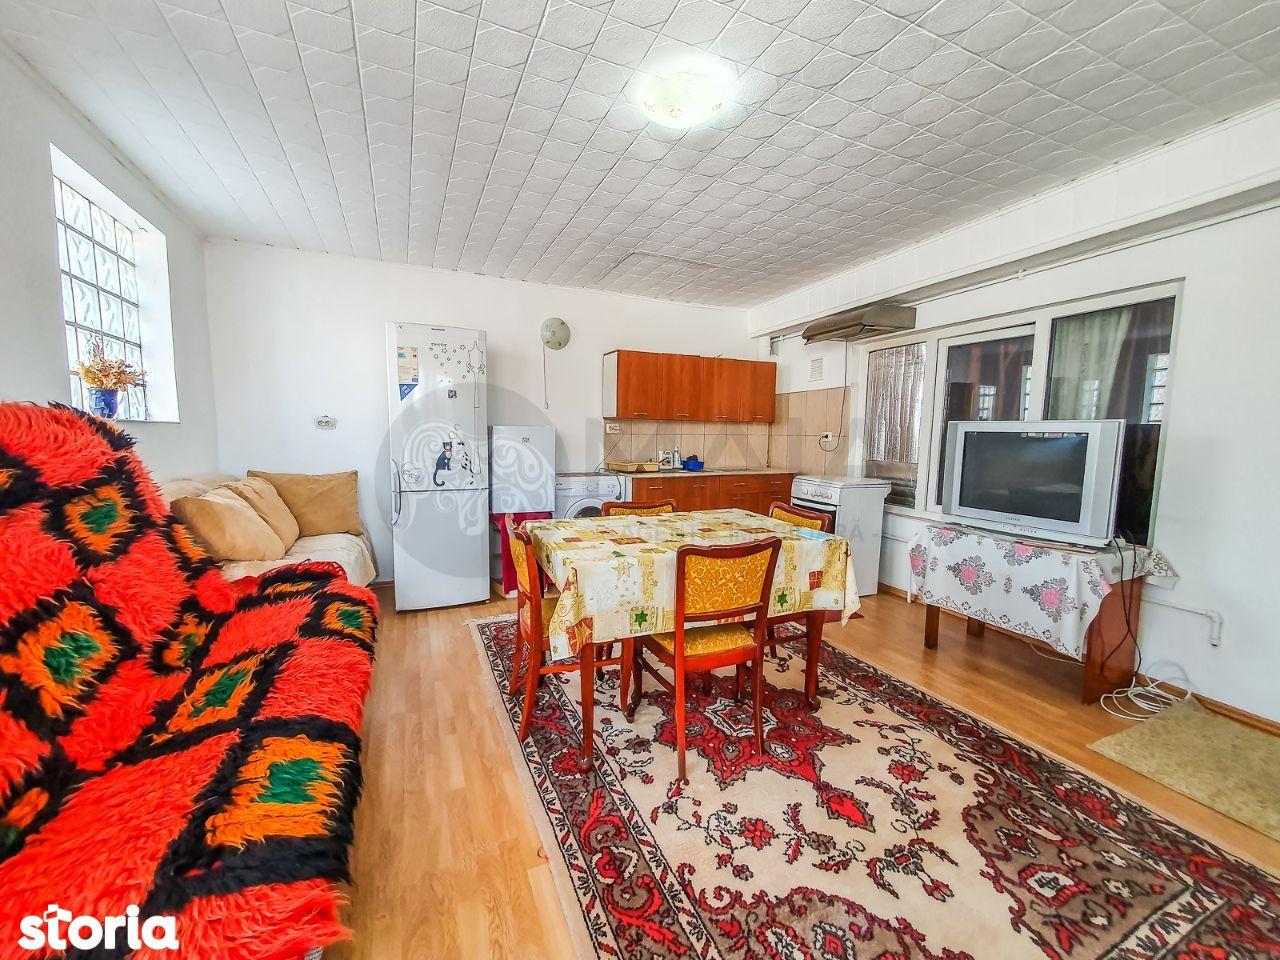 Apartament 2 camere la casa,spatios , toate taxele incluse, Piata Cluj